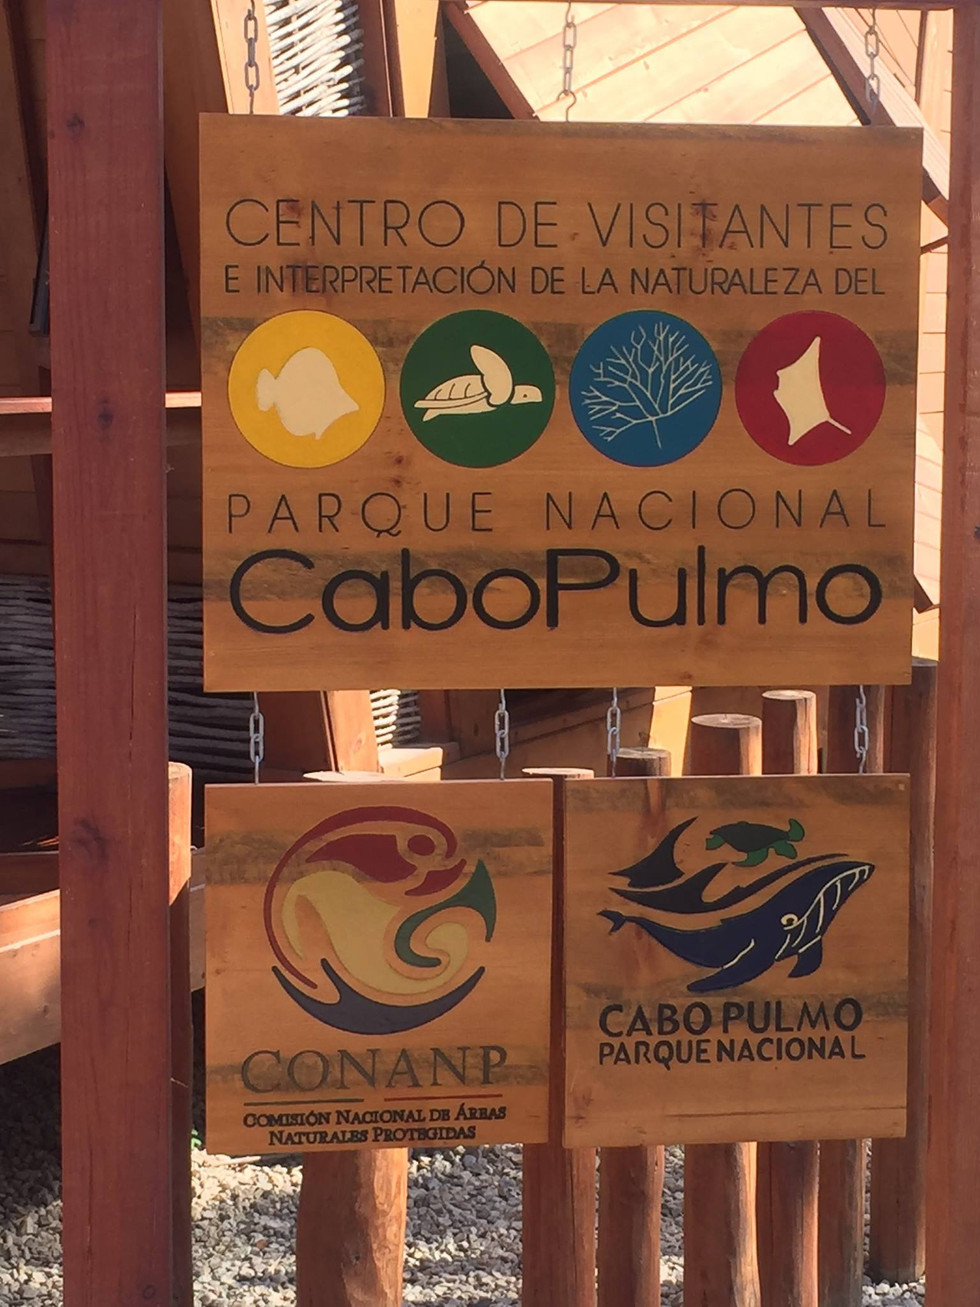 Cabo Pulmo Museum